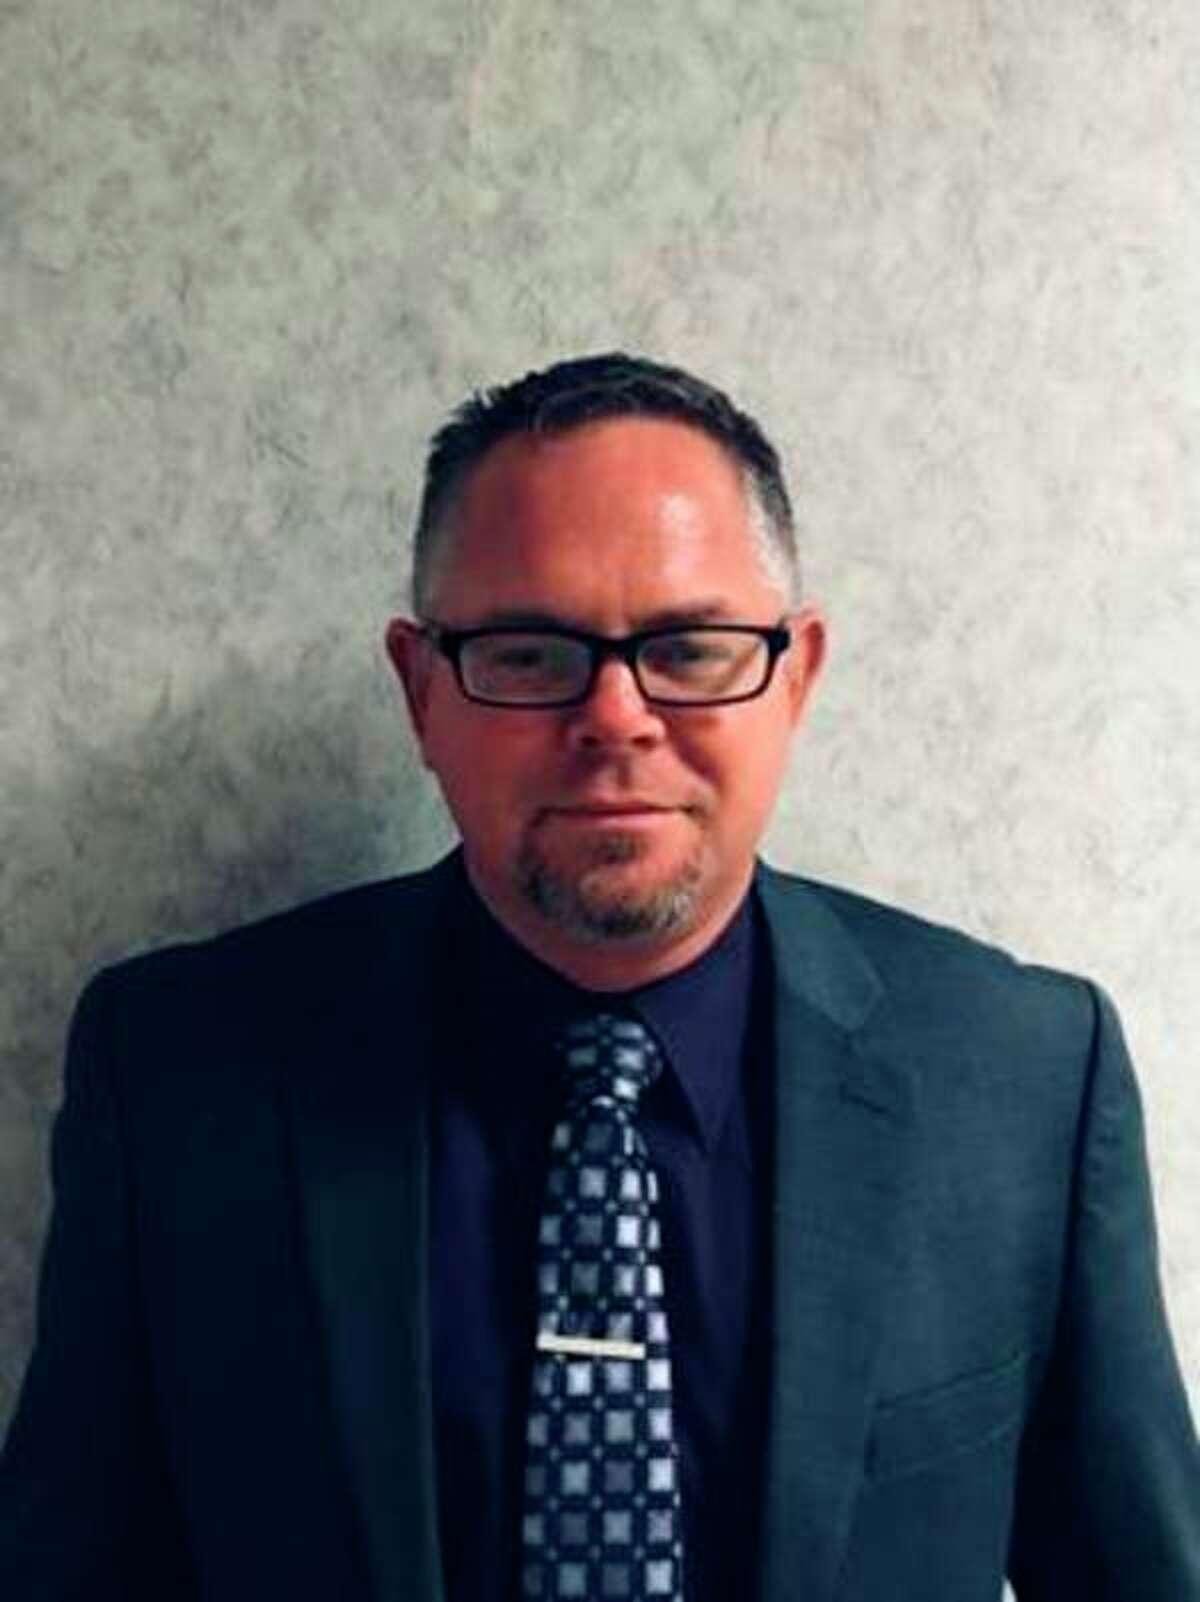 Midland County Chief Deputy Clerk John Keefer